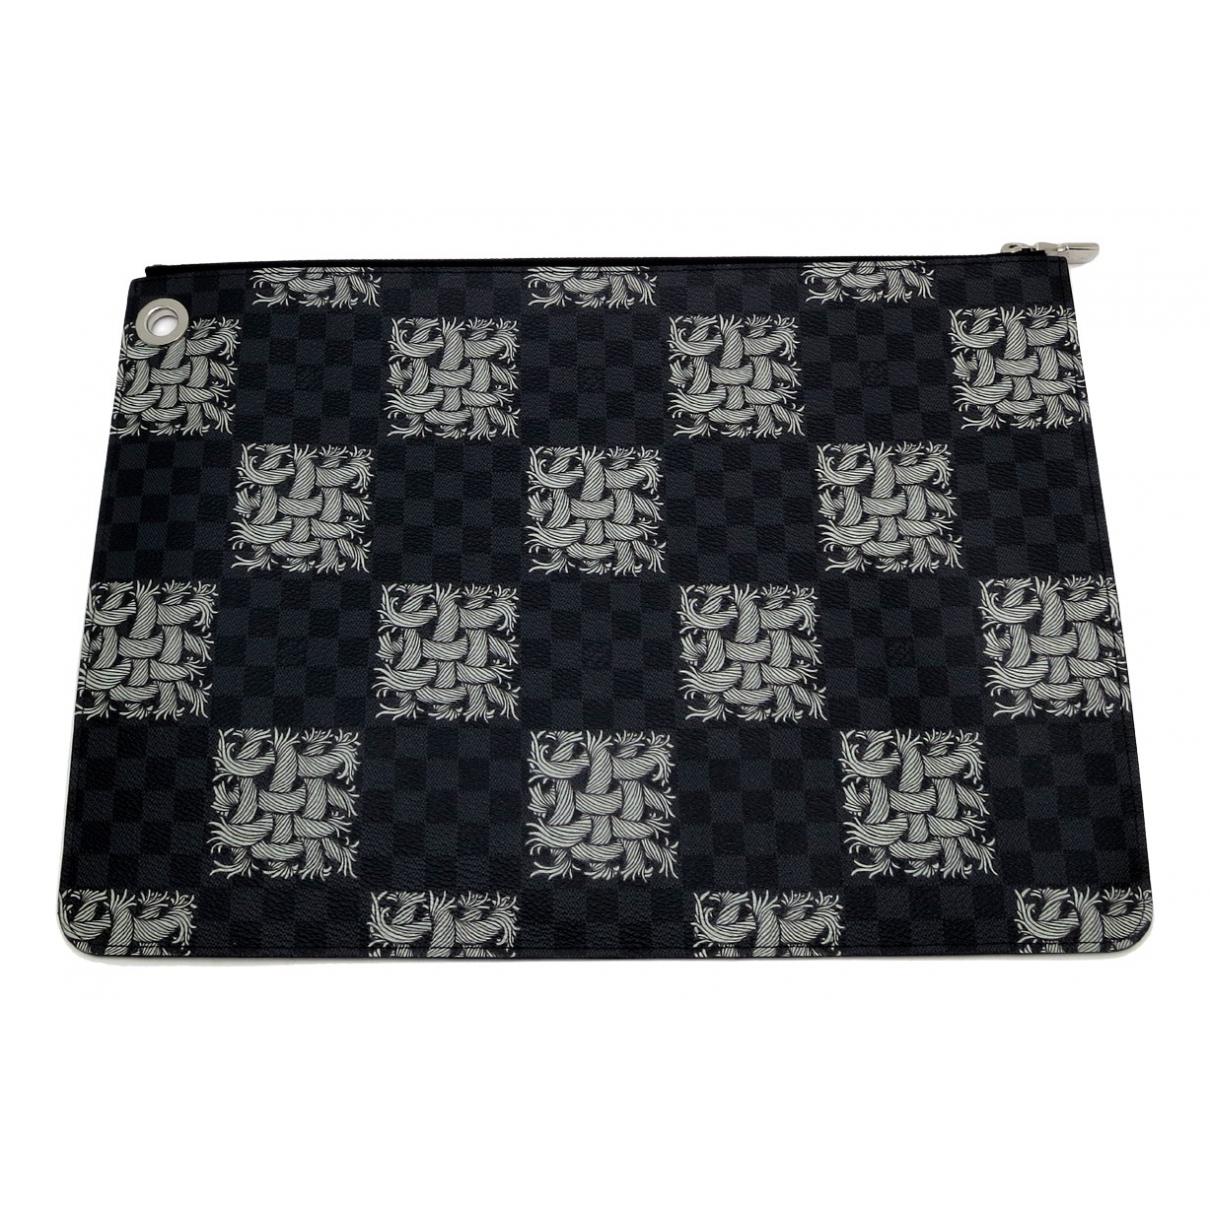 Louis Vuitton N Multicolour Cloth Small bag, wallet & cases for Men N